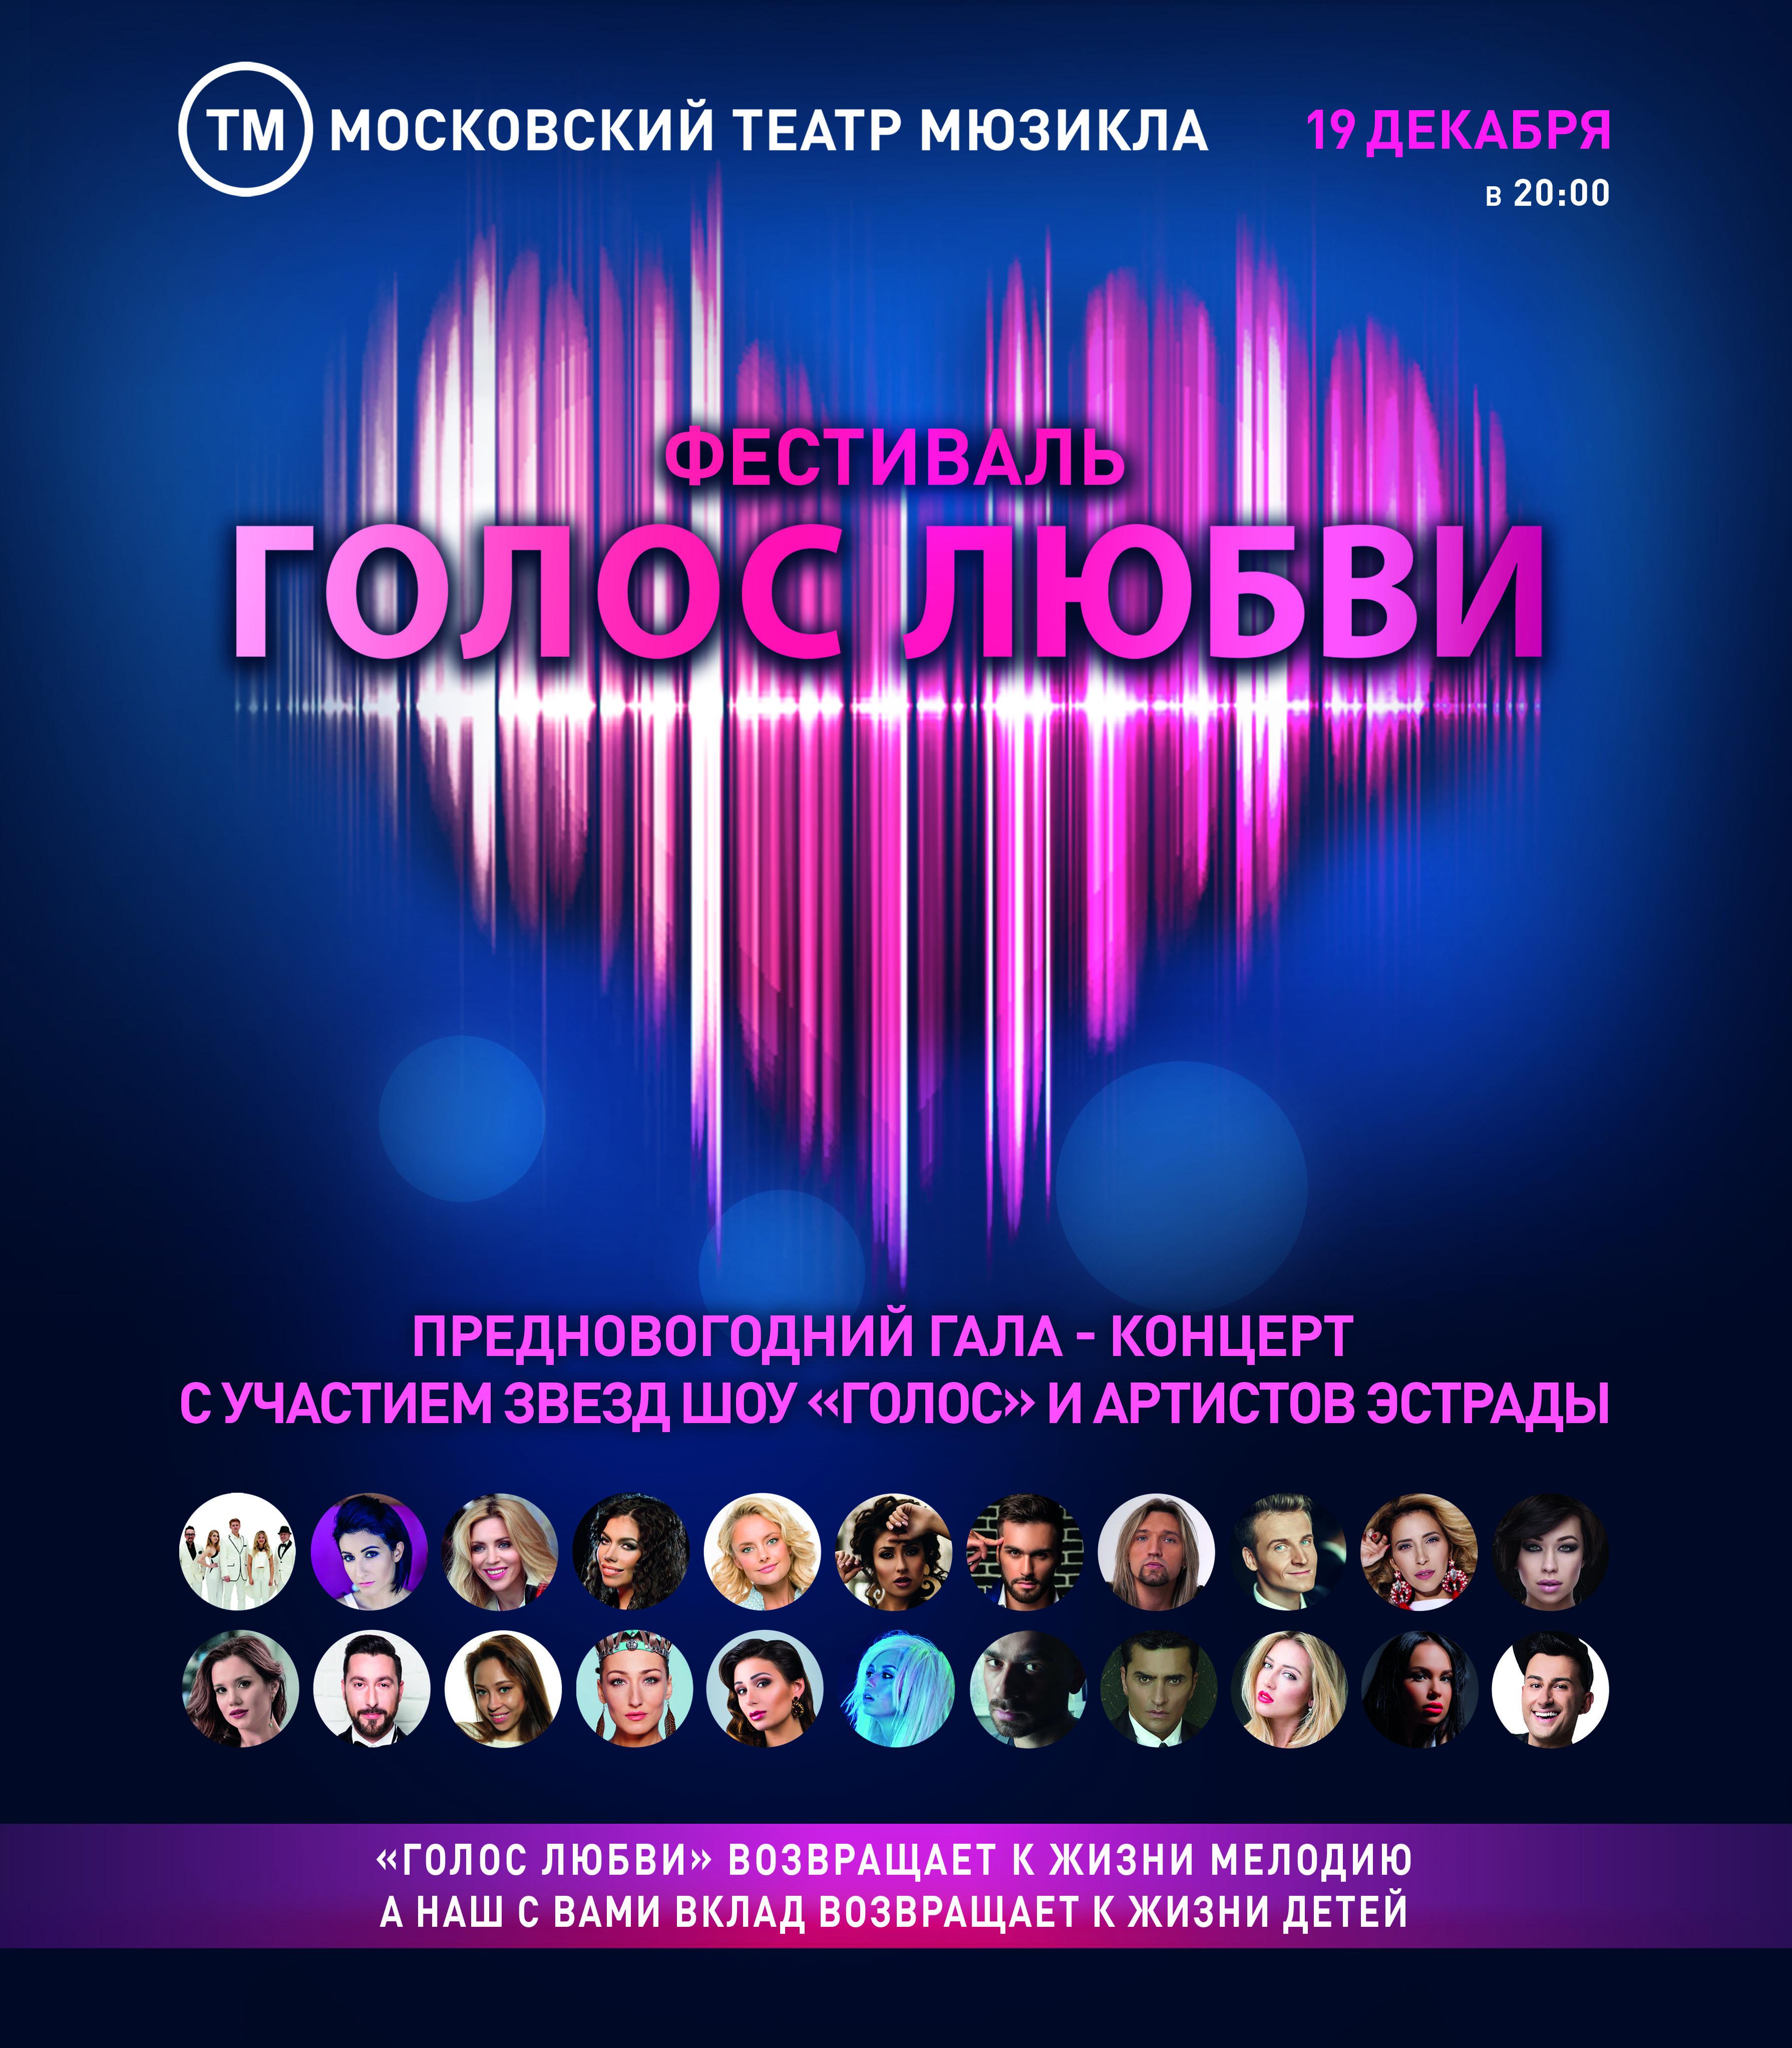 Photo of Голос Любви. Live4Love голос любви Голос Любви. Live4Love VL copy CMYK